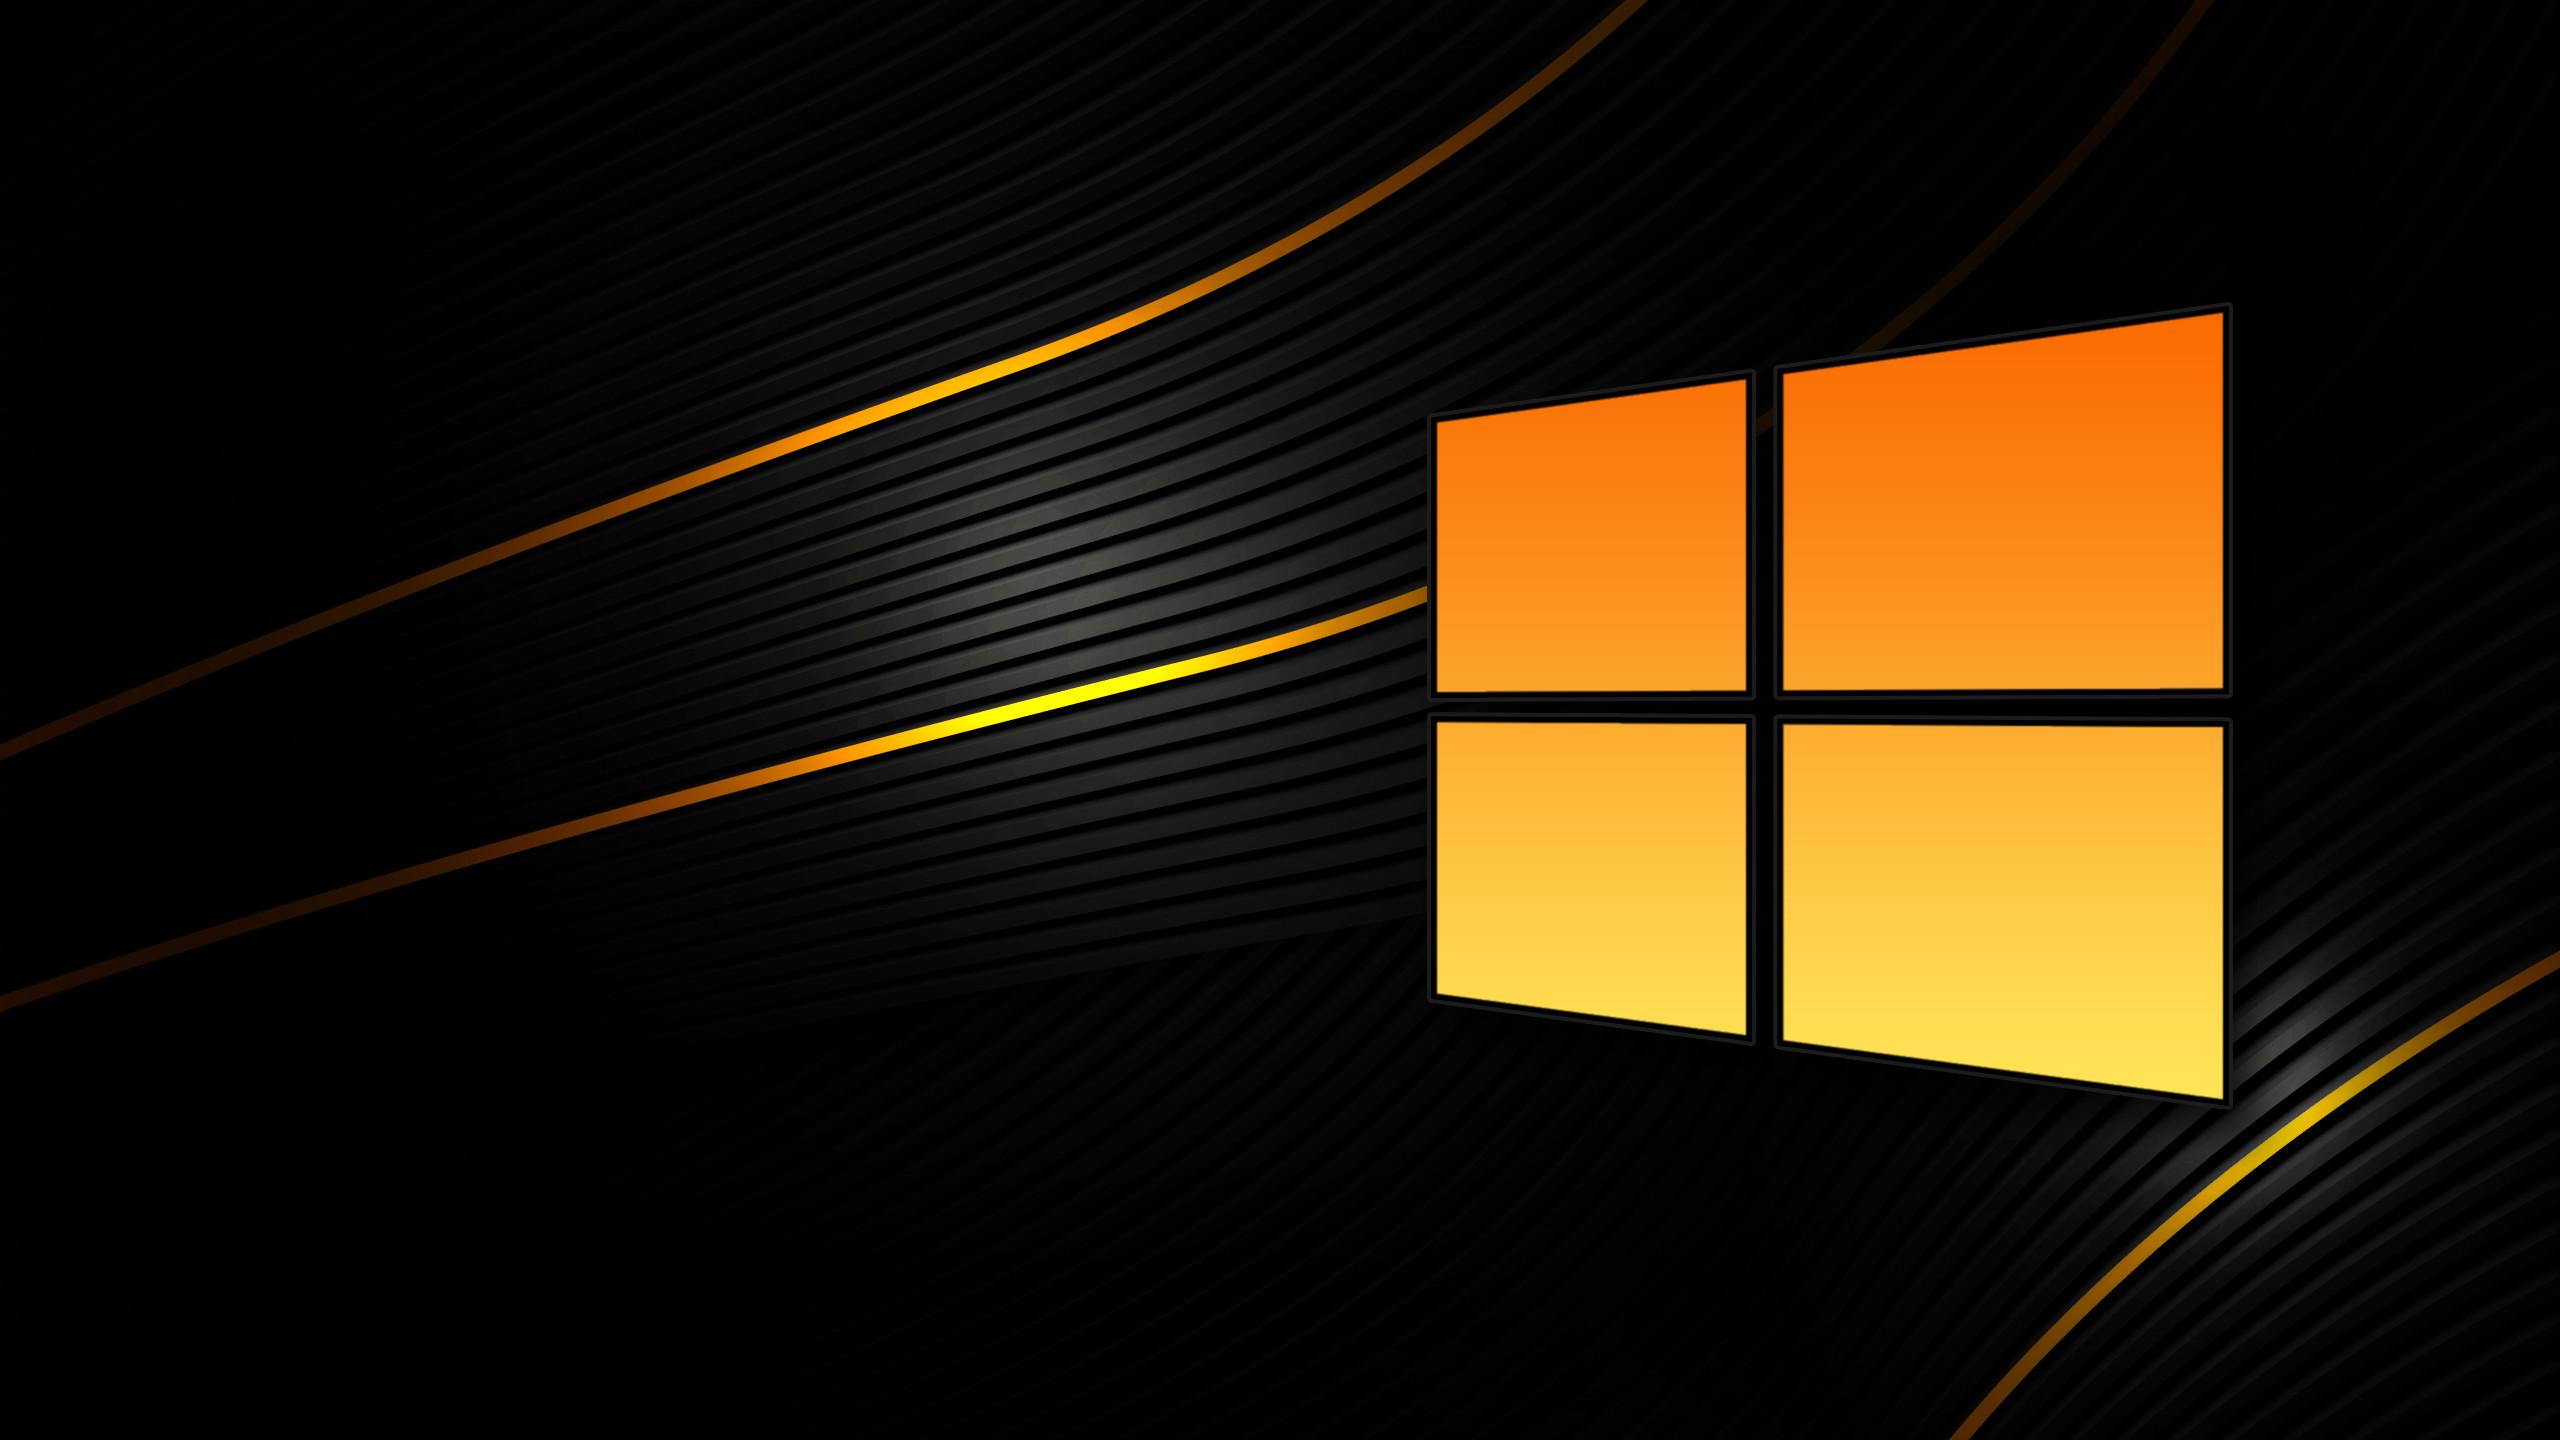 windows 10 wallpaper hd,yellow,orange,light,line,design